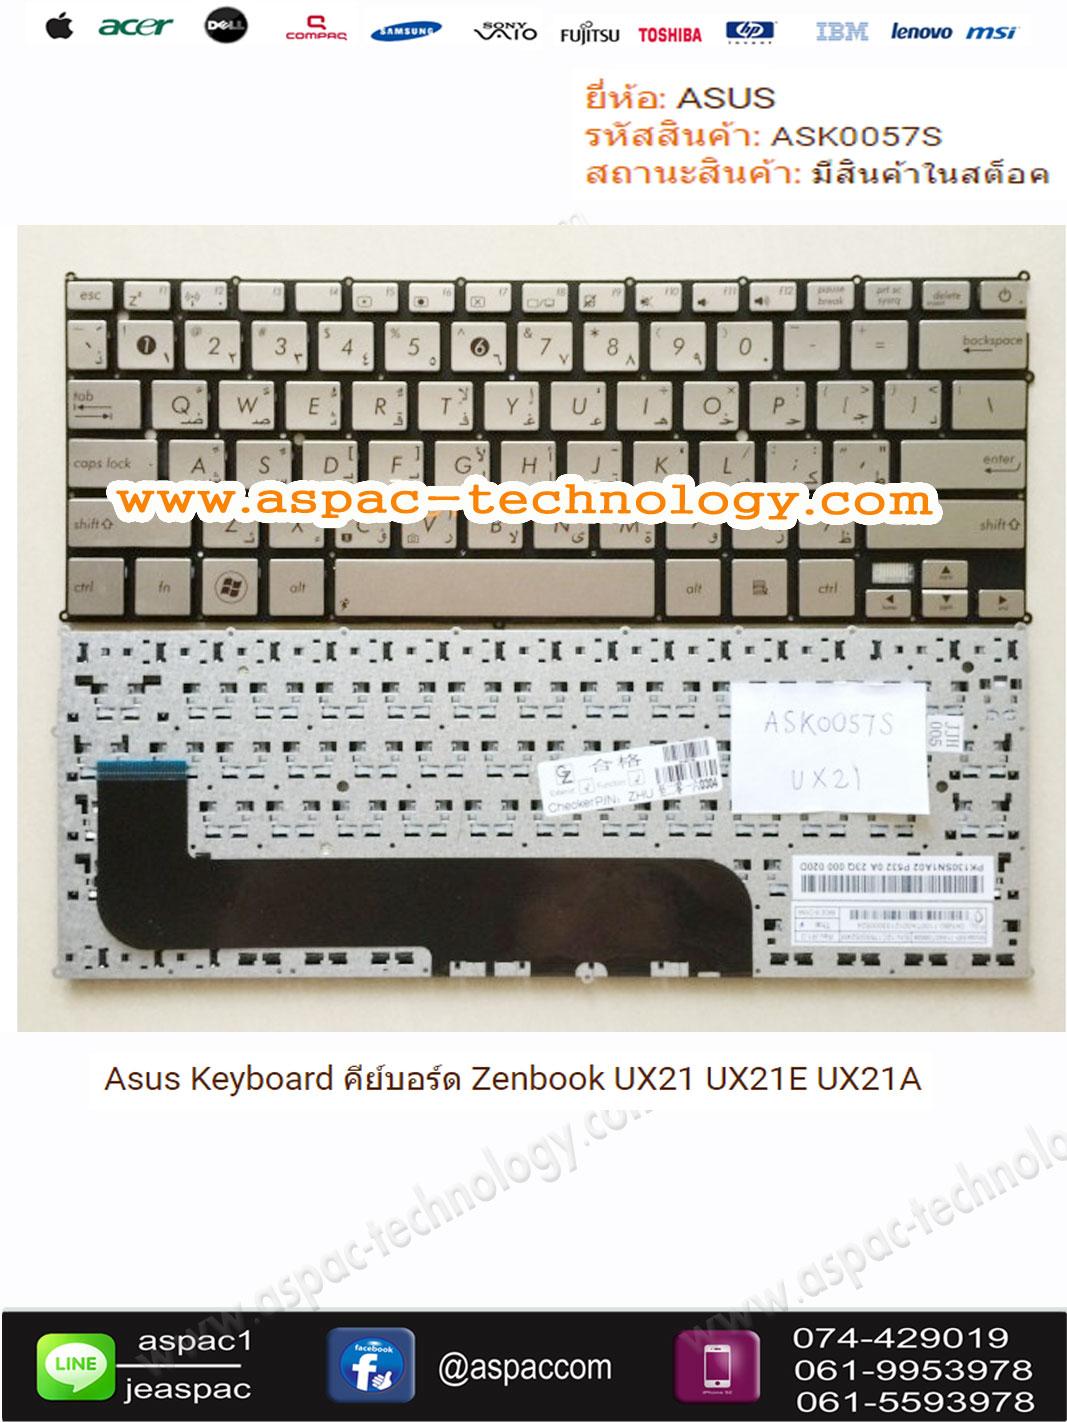 Asus Keyboard คีย์บอร์ด Zenbook UX21 UX21E UX21A